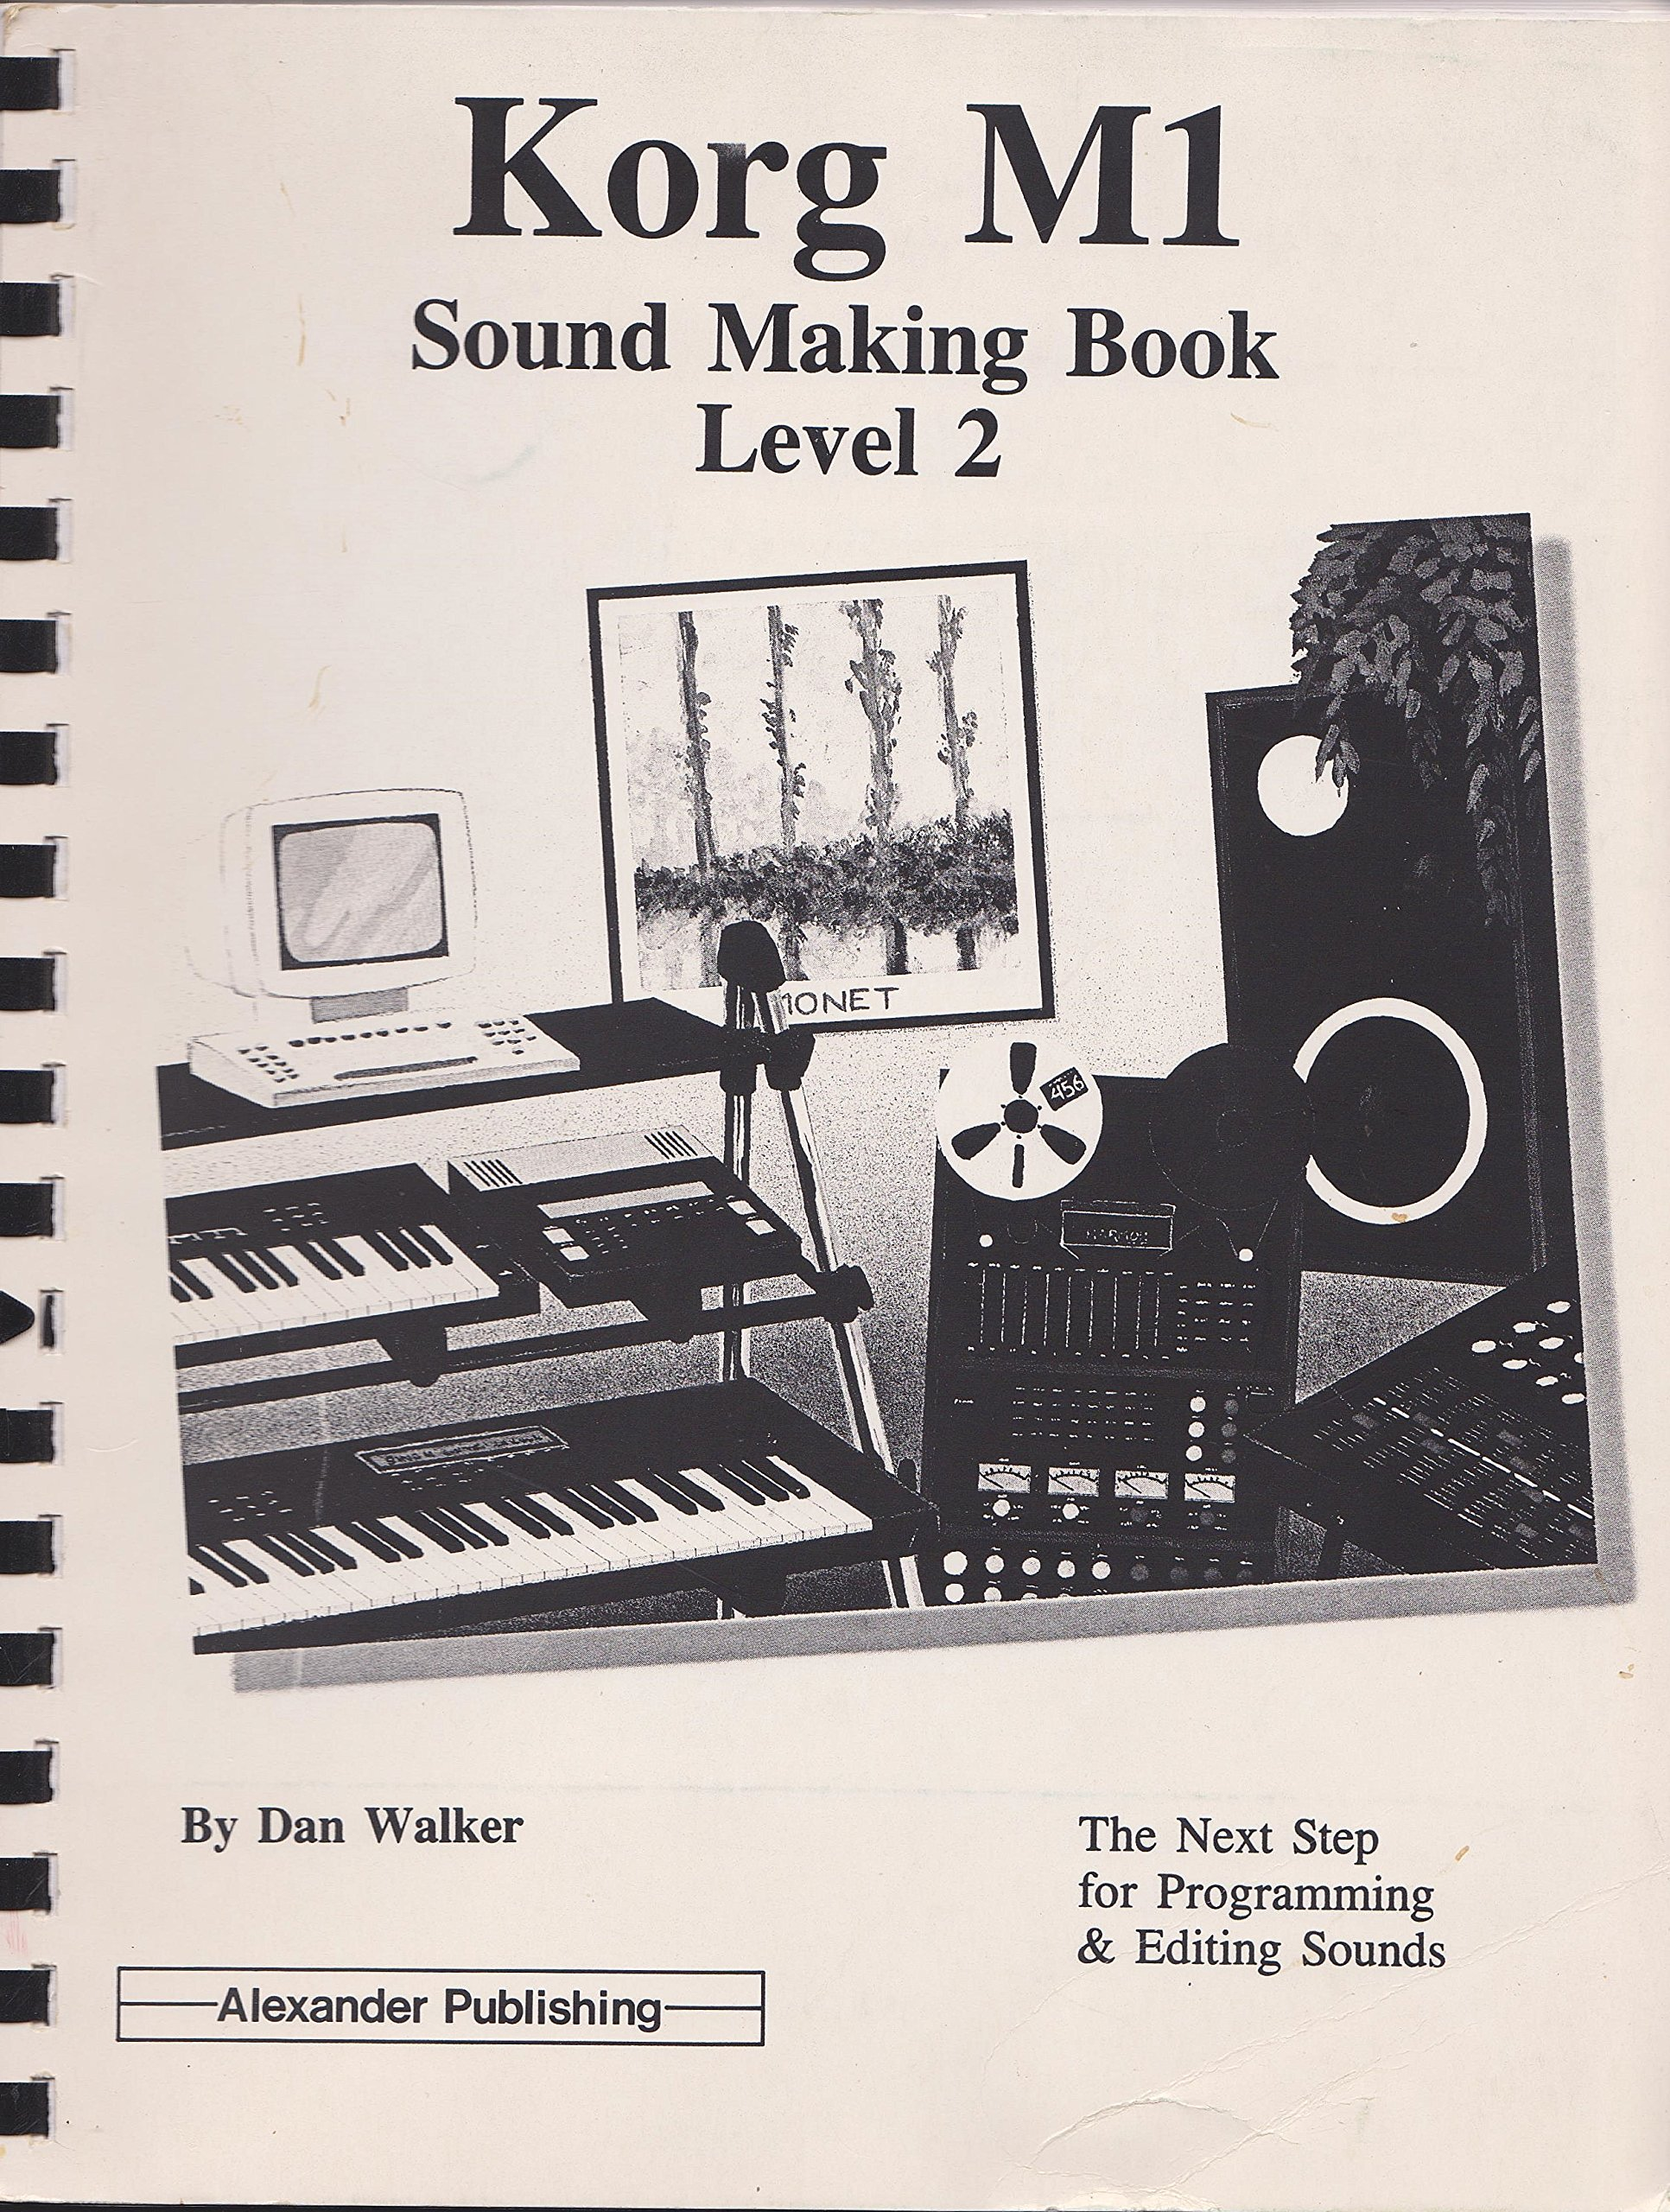 Korg M1 Sound Making Book, Level 2: Dan Walker